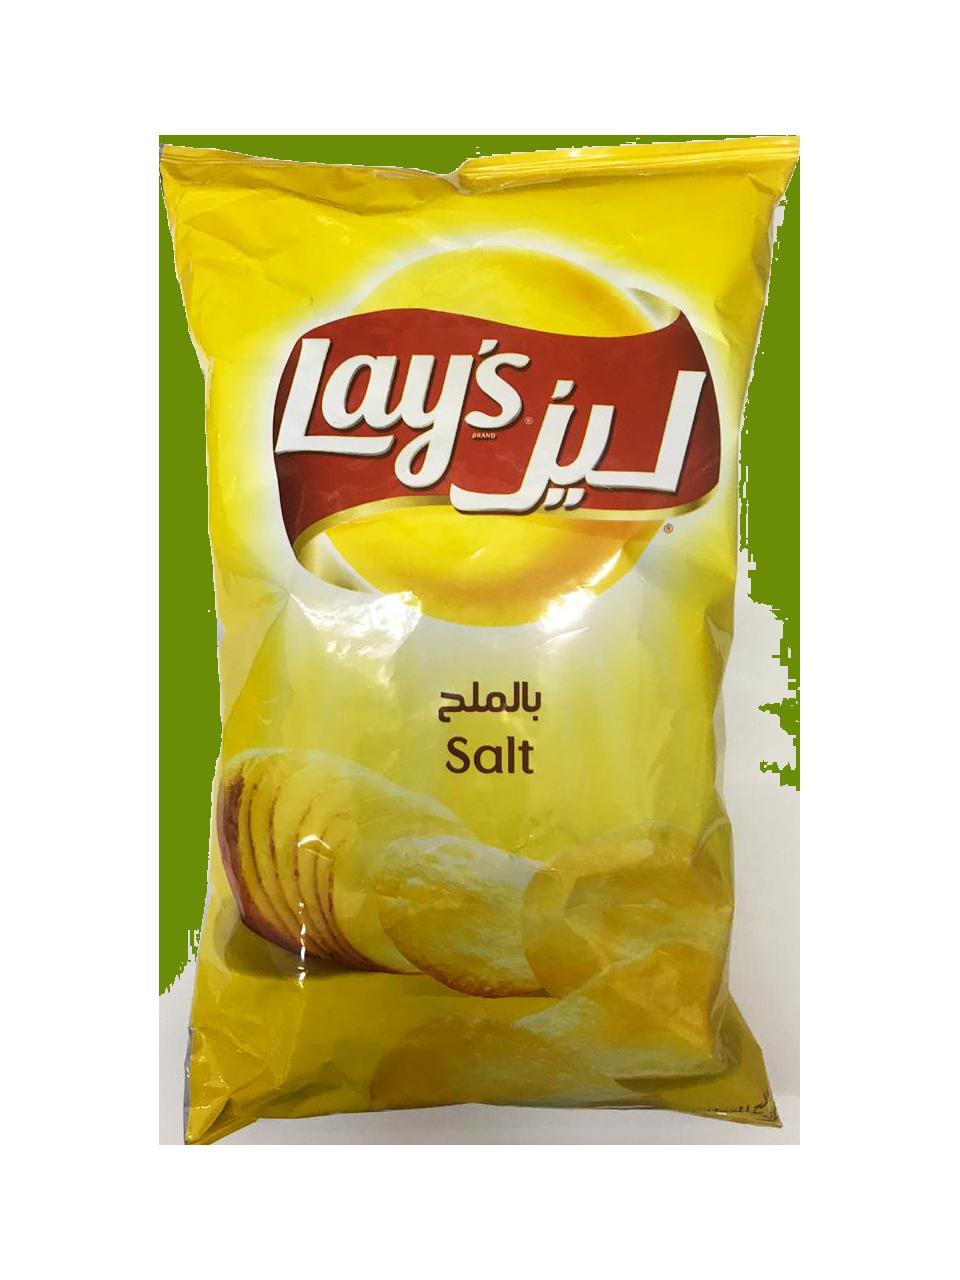 Lays Salt 185g (Big)